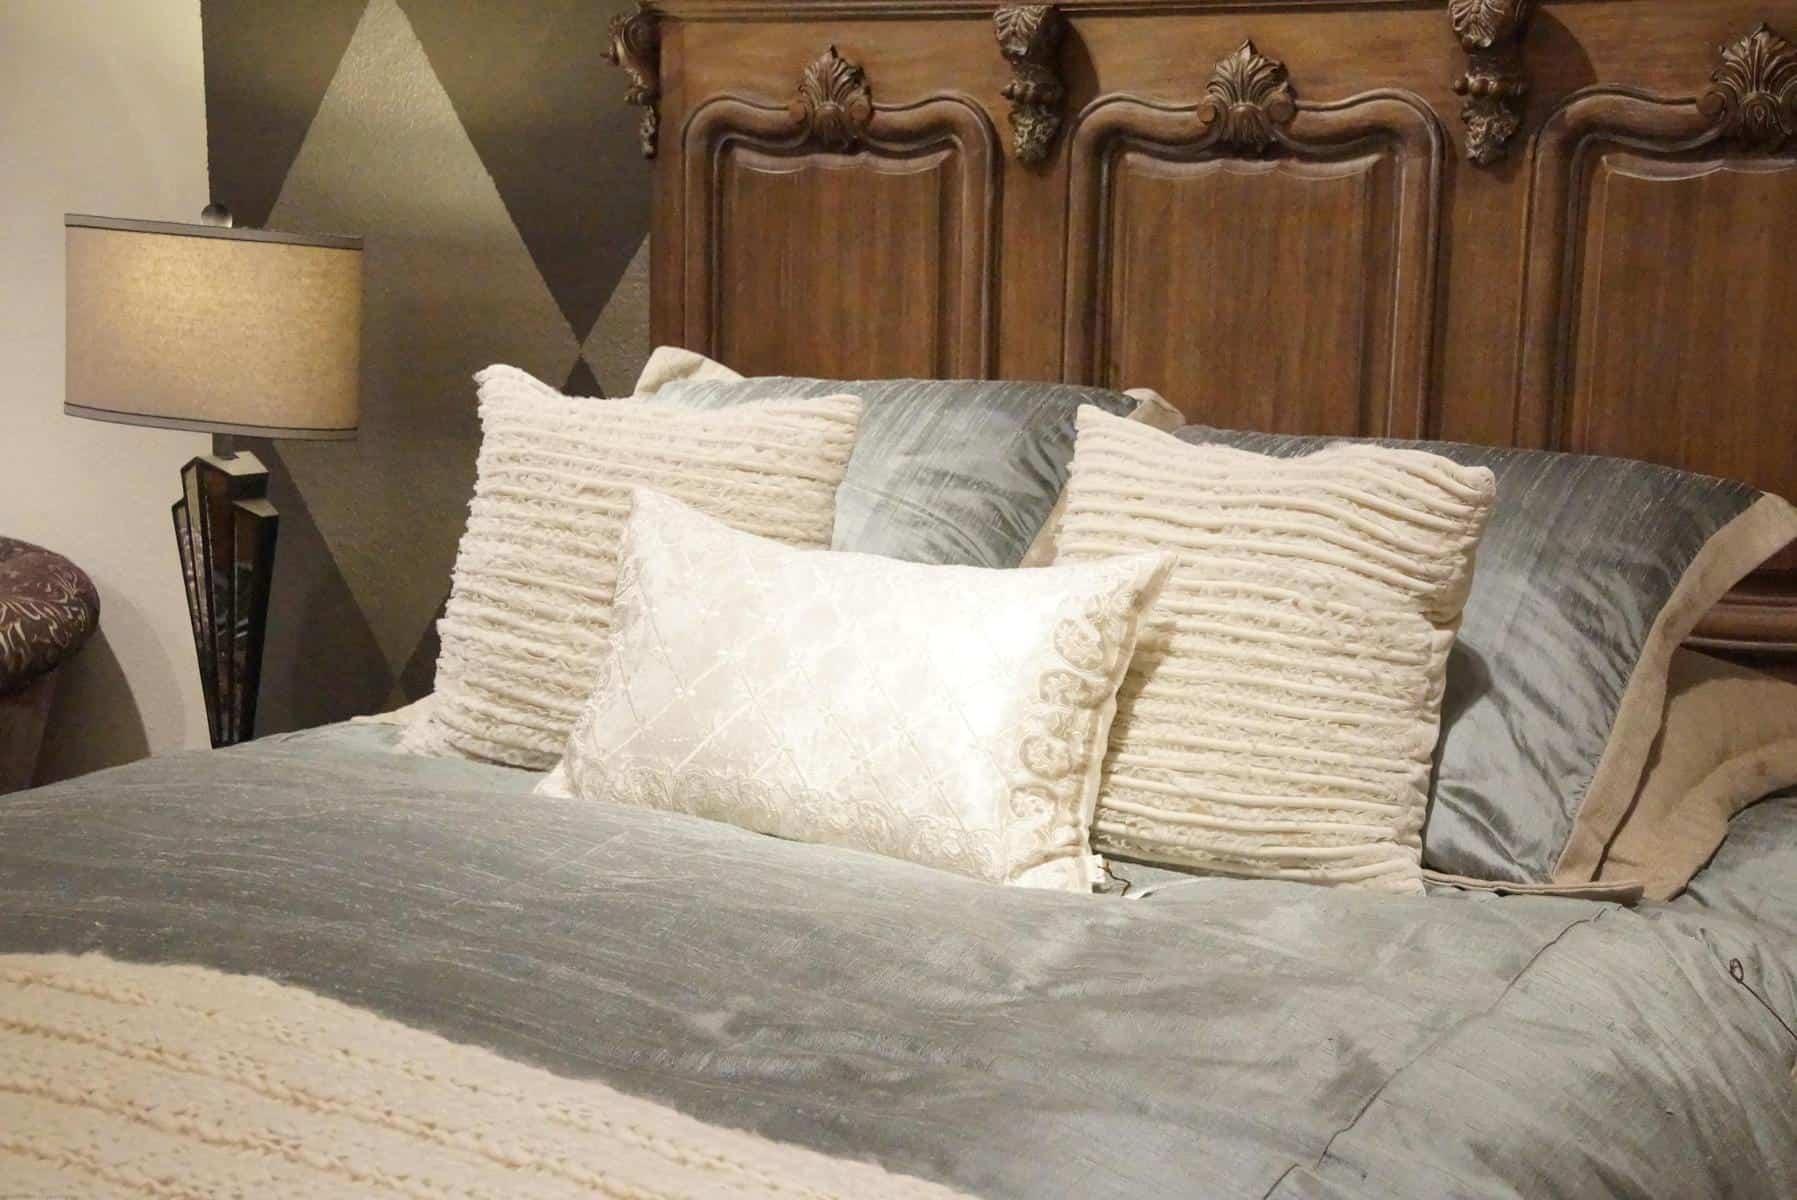 Arhaus Furniture: Favorite Source for Home Decor | HeartWork ...